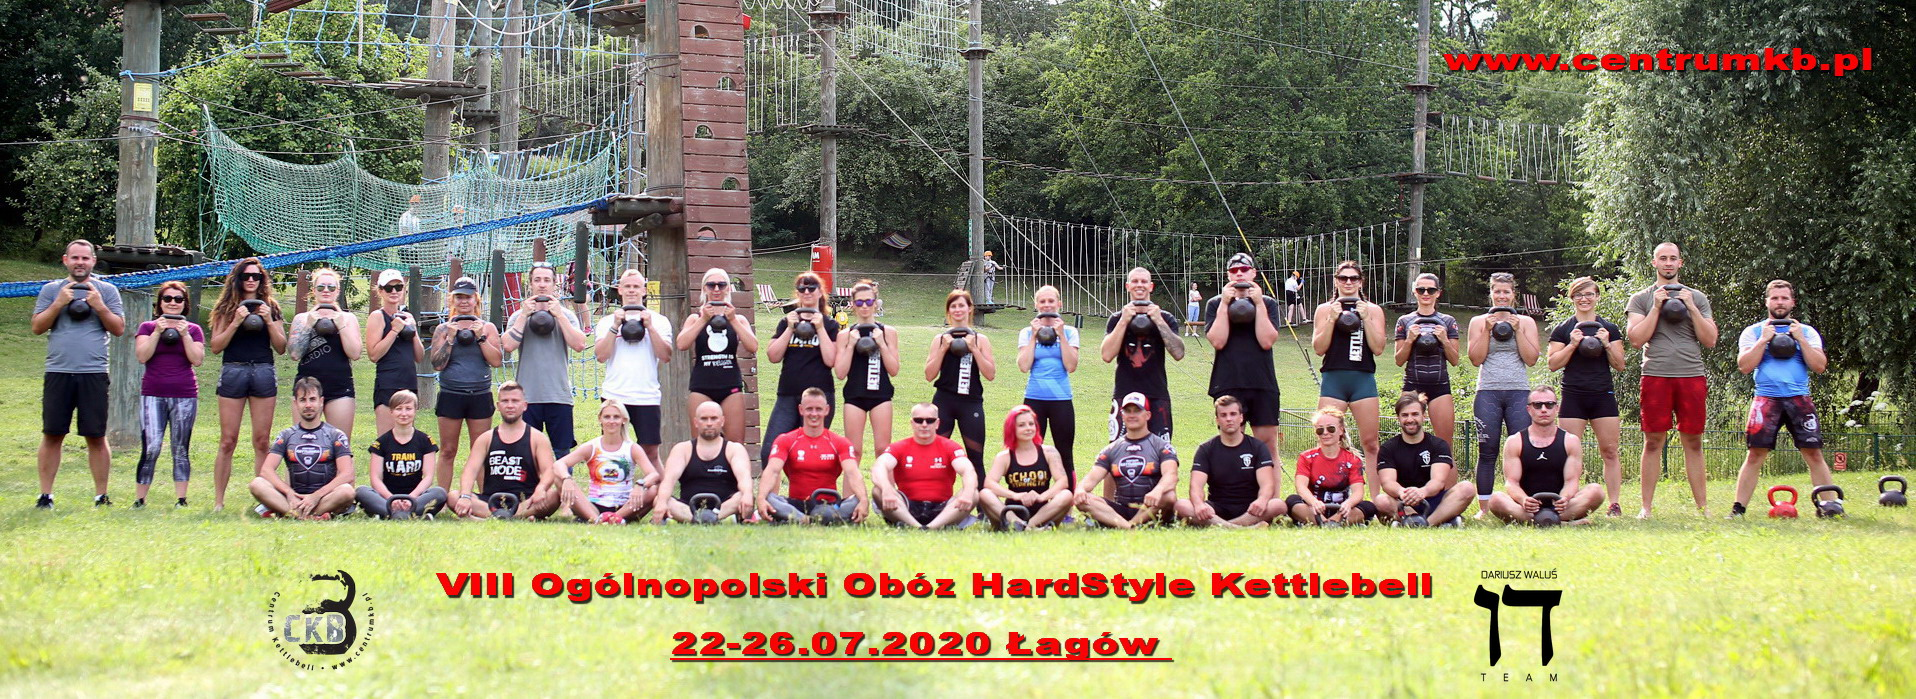 20200726_viii_hardstyle_kettlebell_full